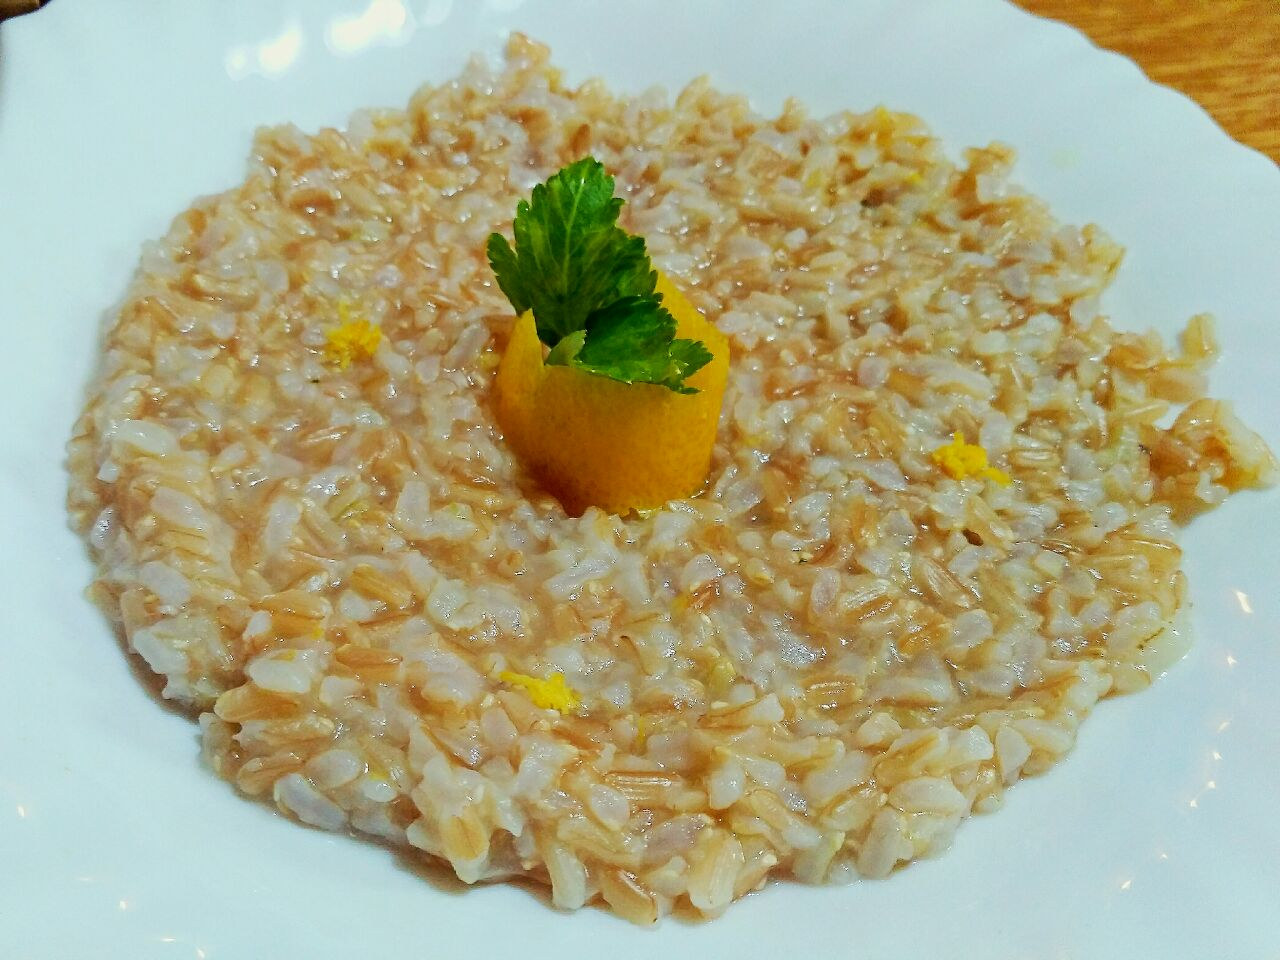 Primi piatti vegani: riso thaibbonet integrale al limone